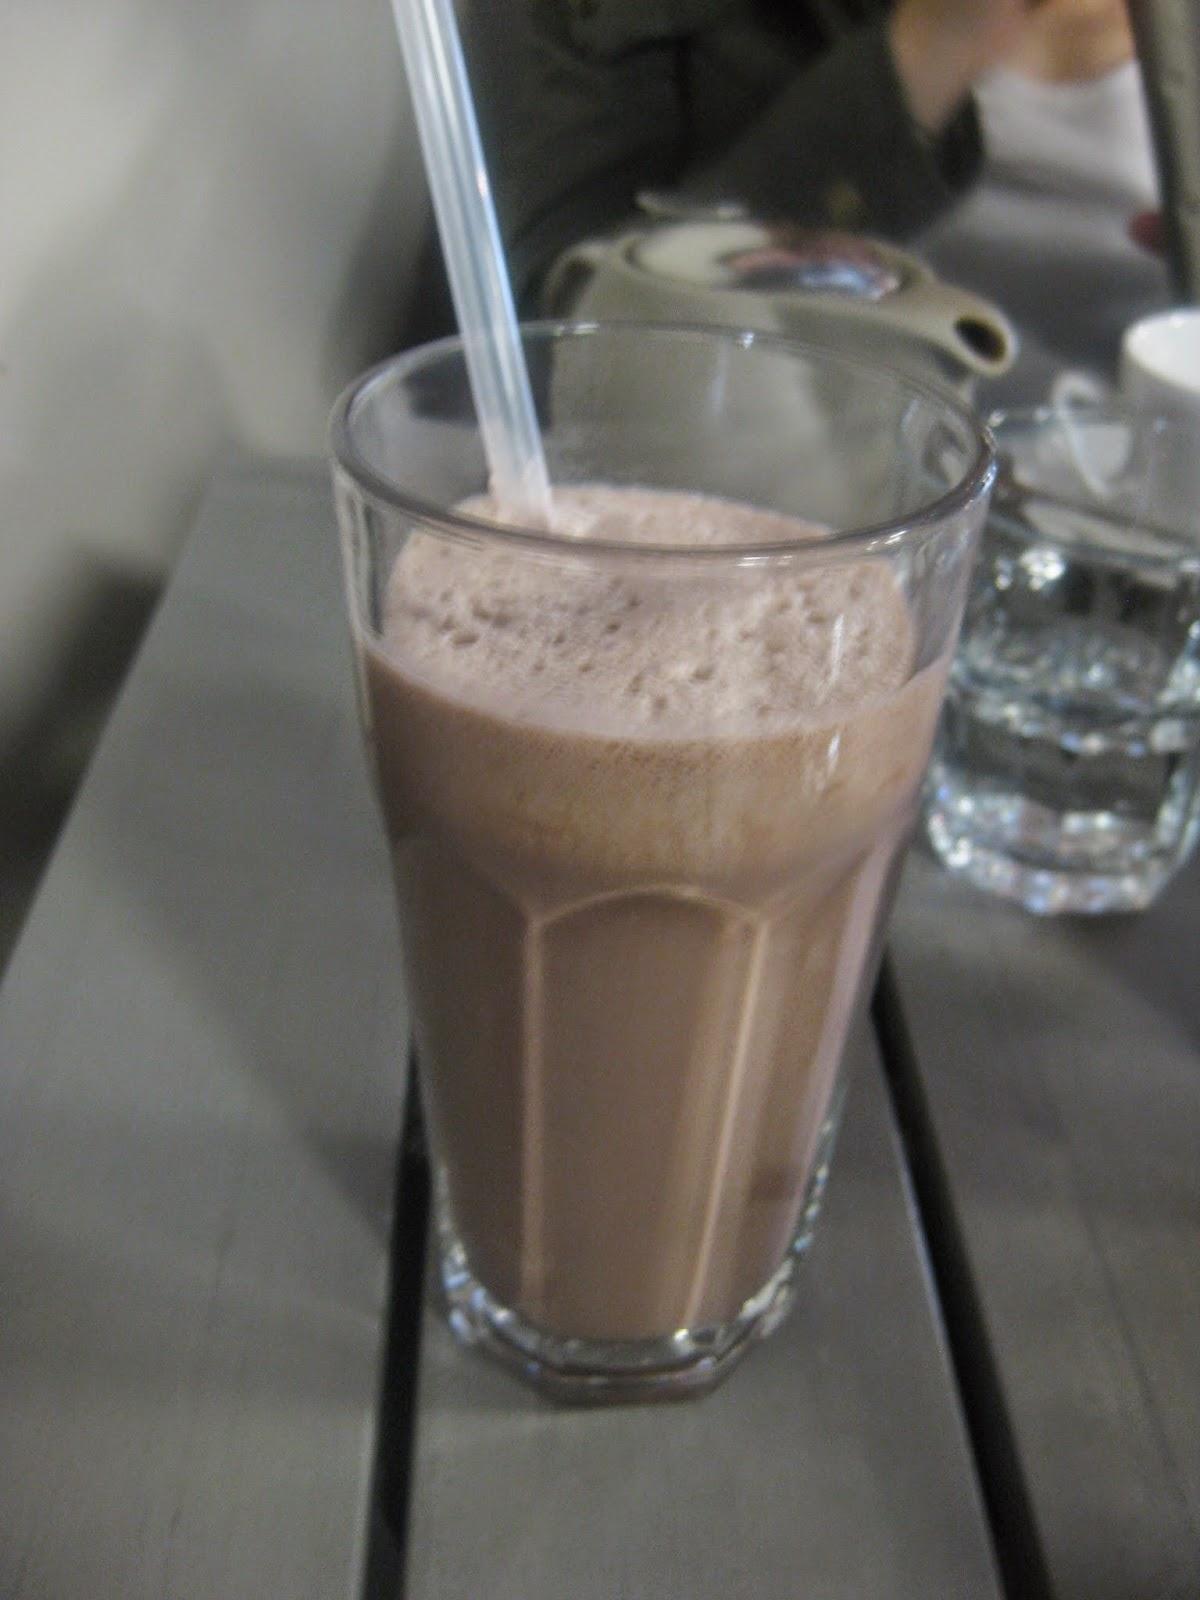 Cassie Cakes Review of Plenty chocolate milkshake